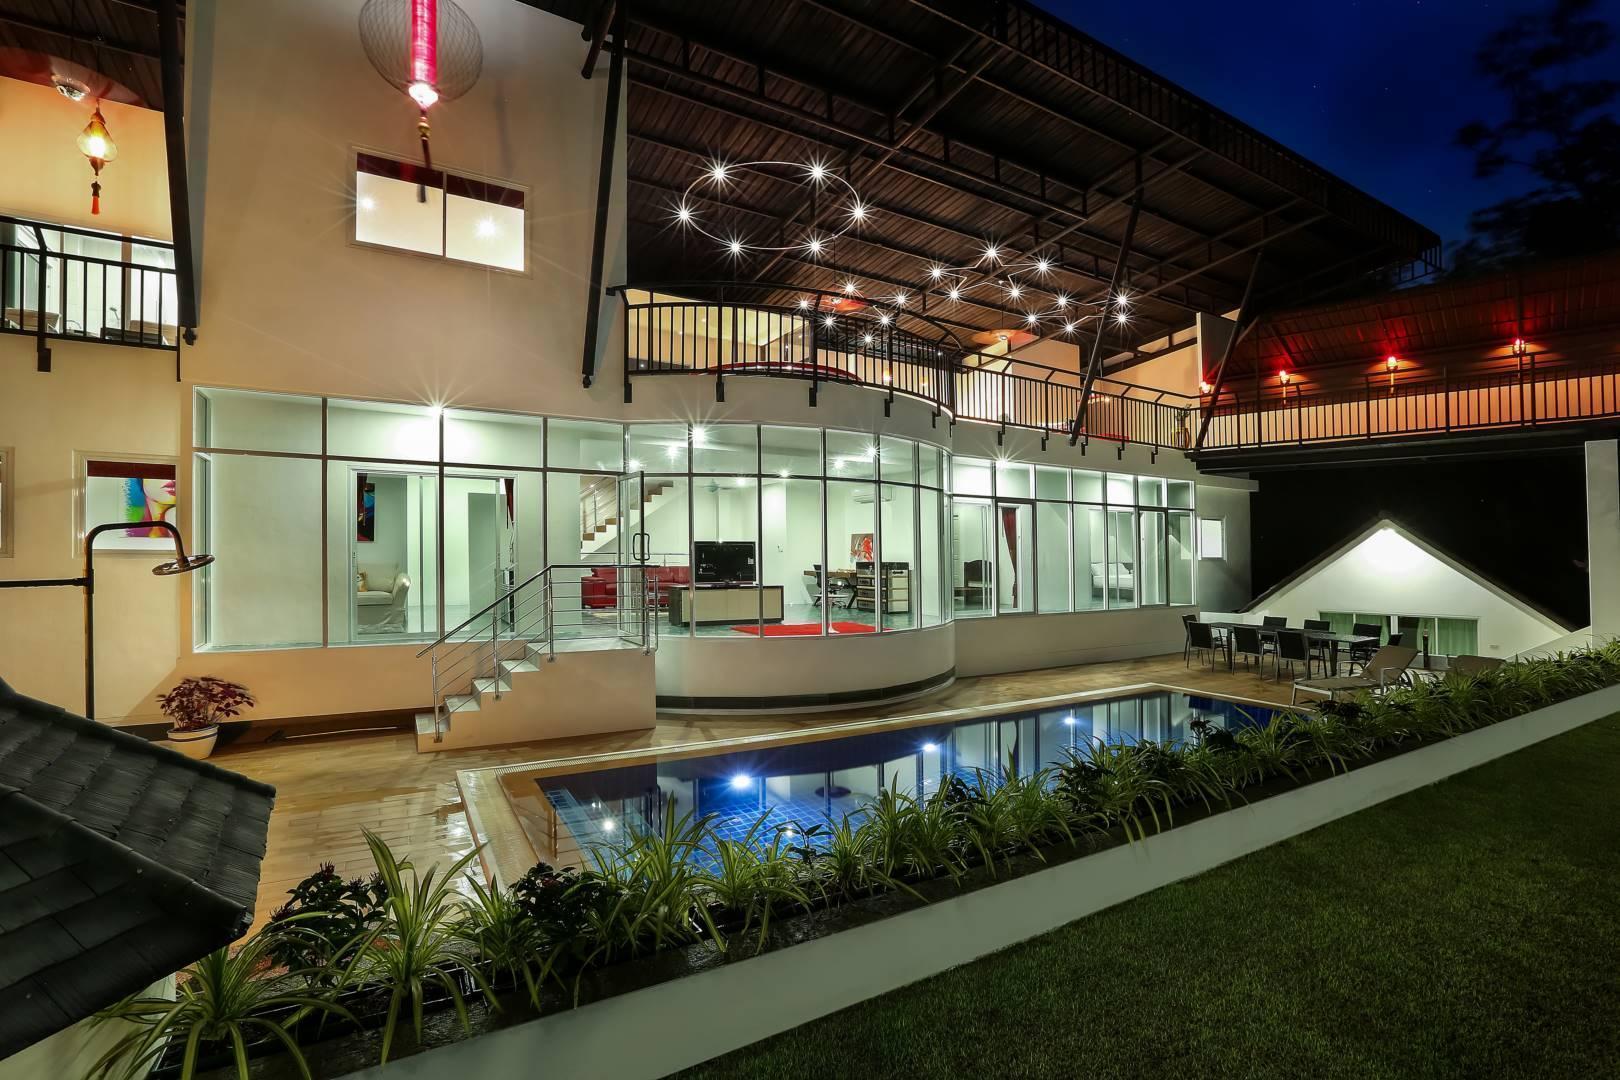 Private Pool Villa for Family 5 bedrooms วิลลา 5 ห้องนอน 6 ห้องน้ำส่วนตัว ขนาด 2000 ตร.ม. – ฉลอง